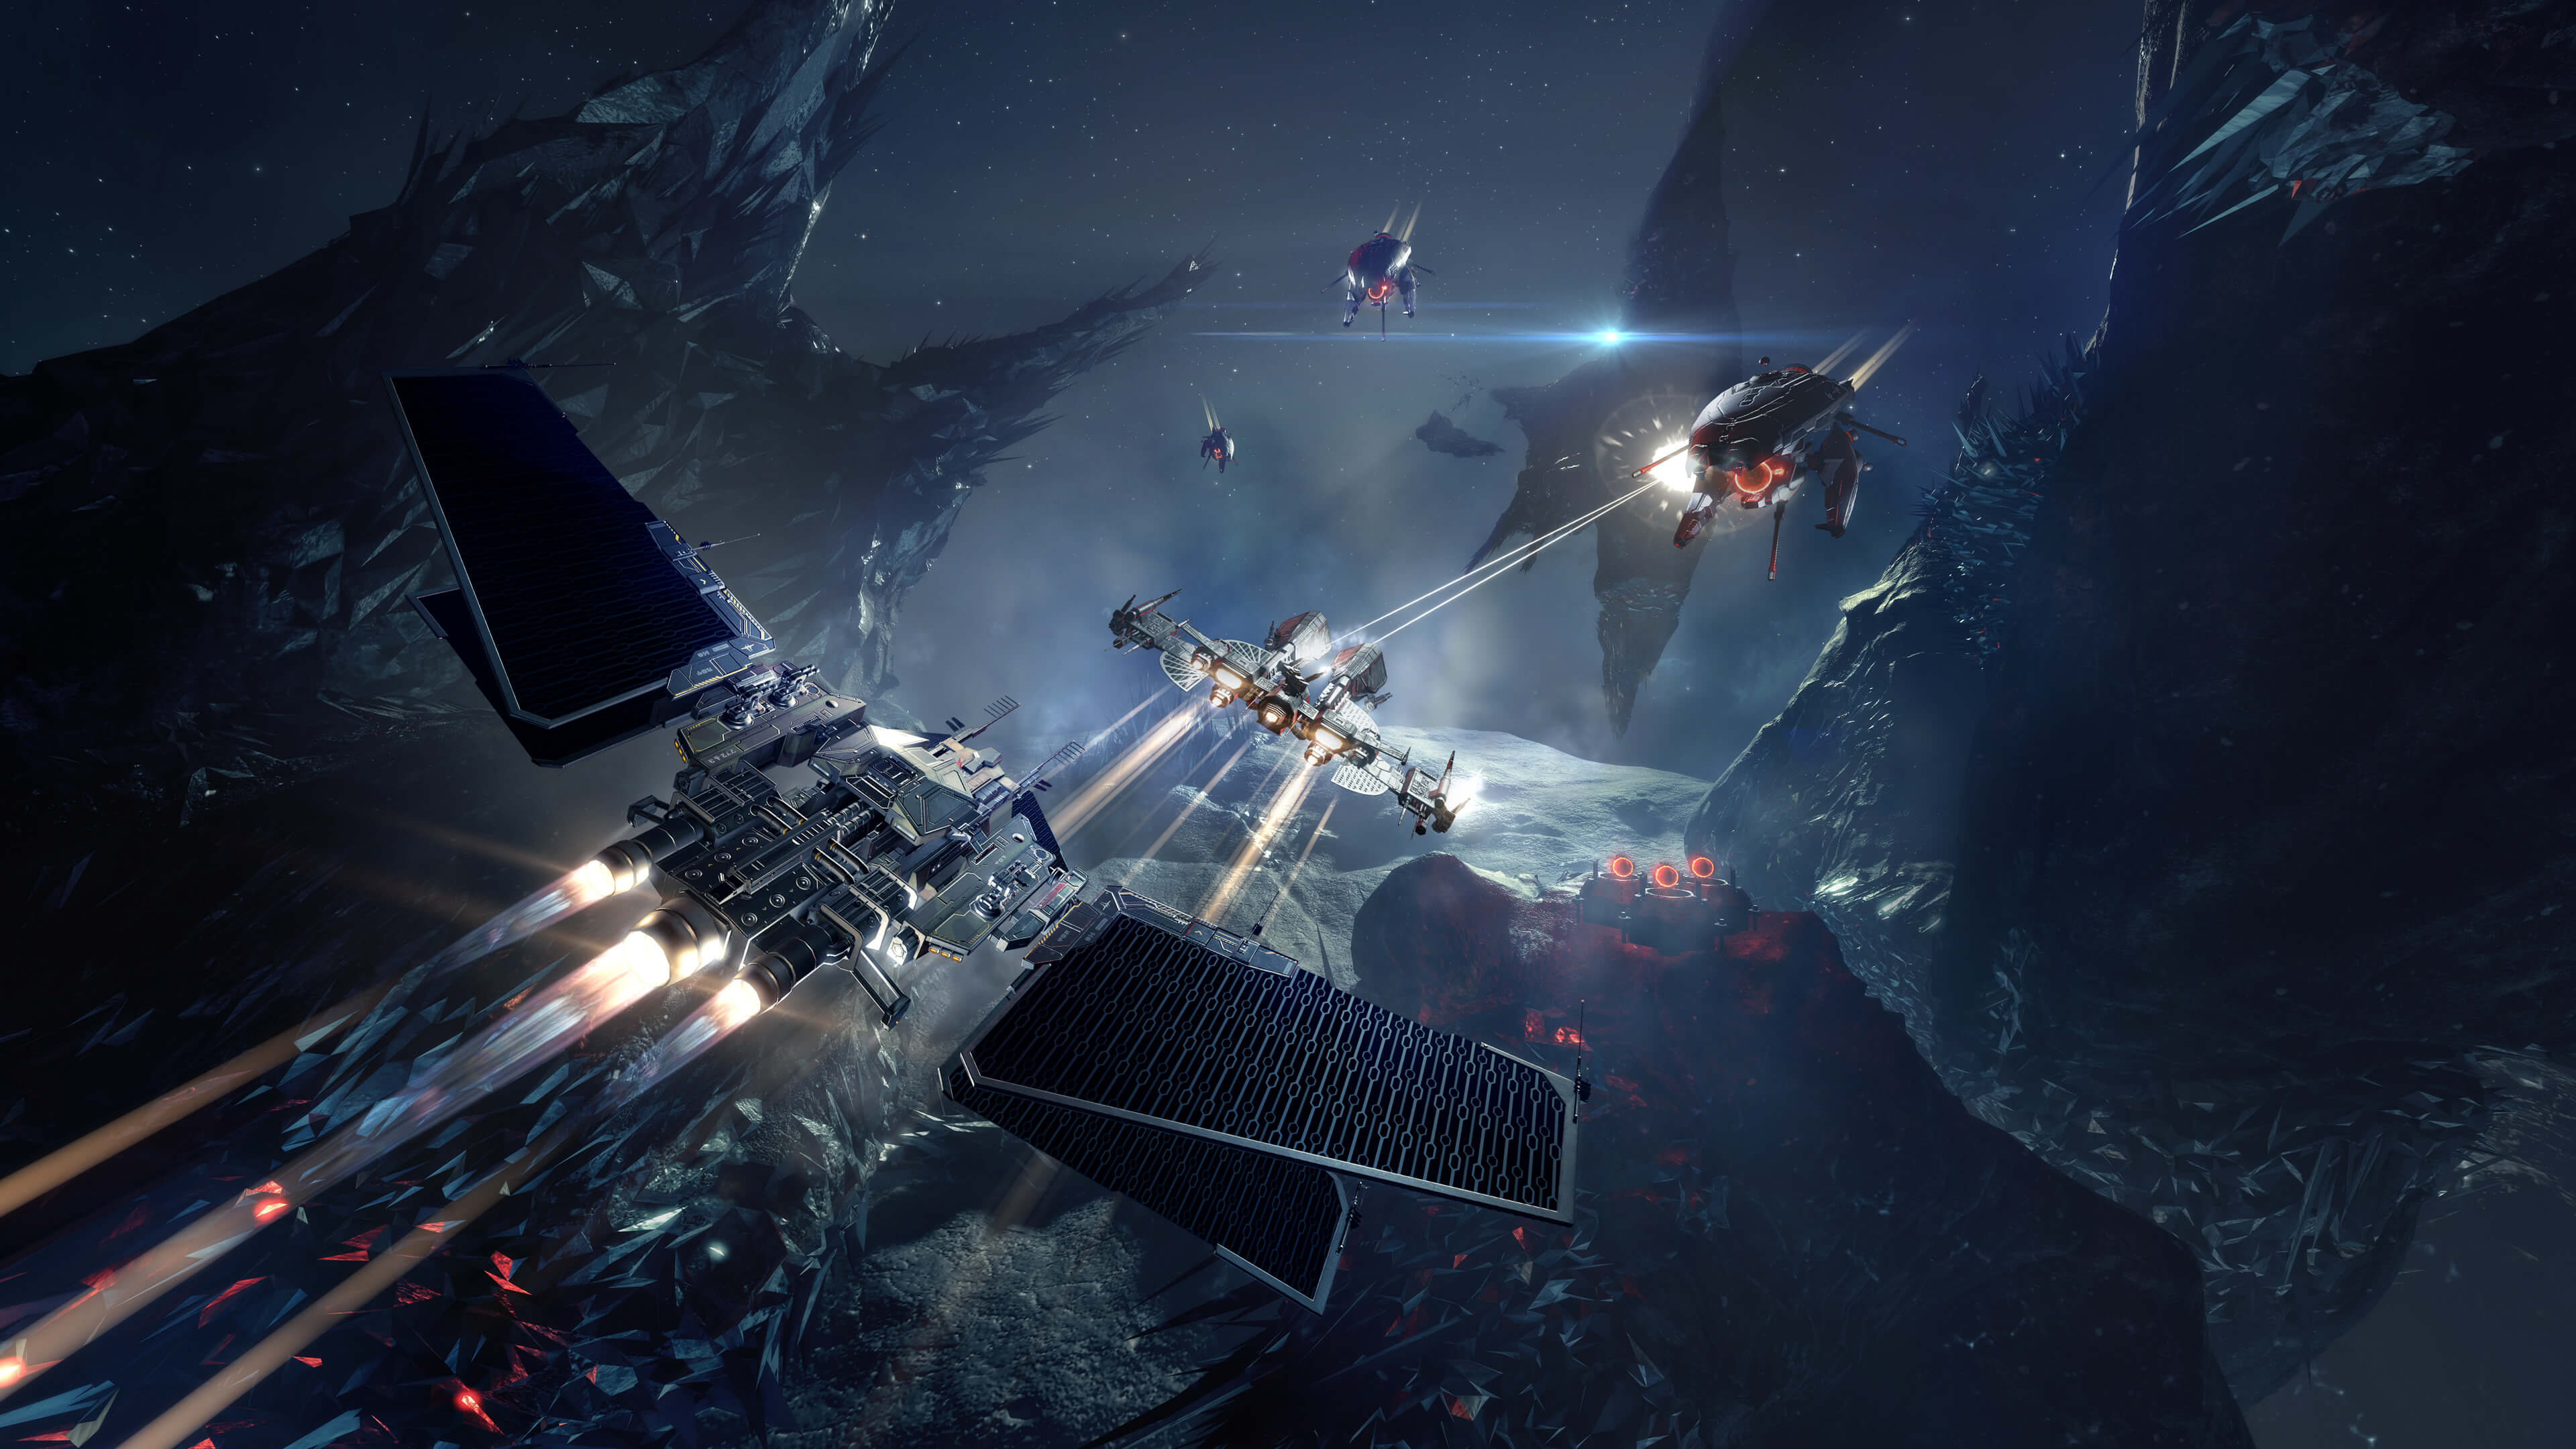 eve online spaceships